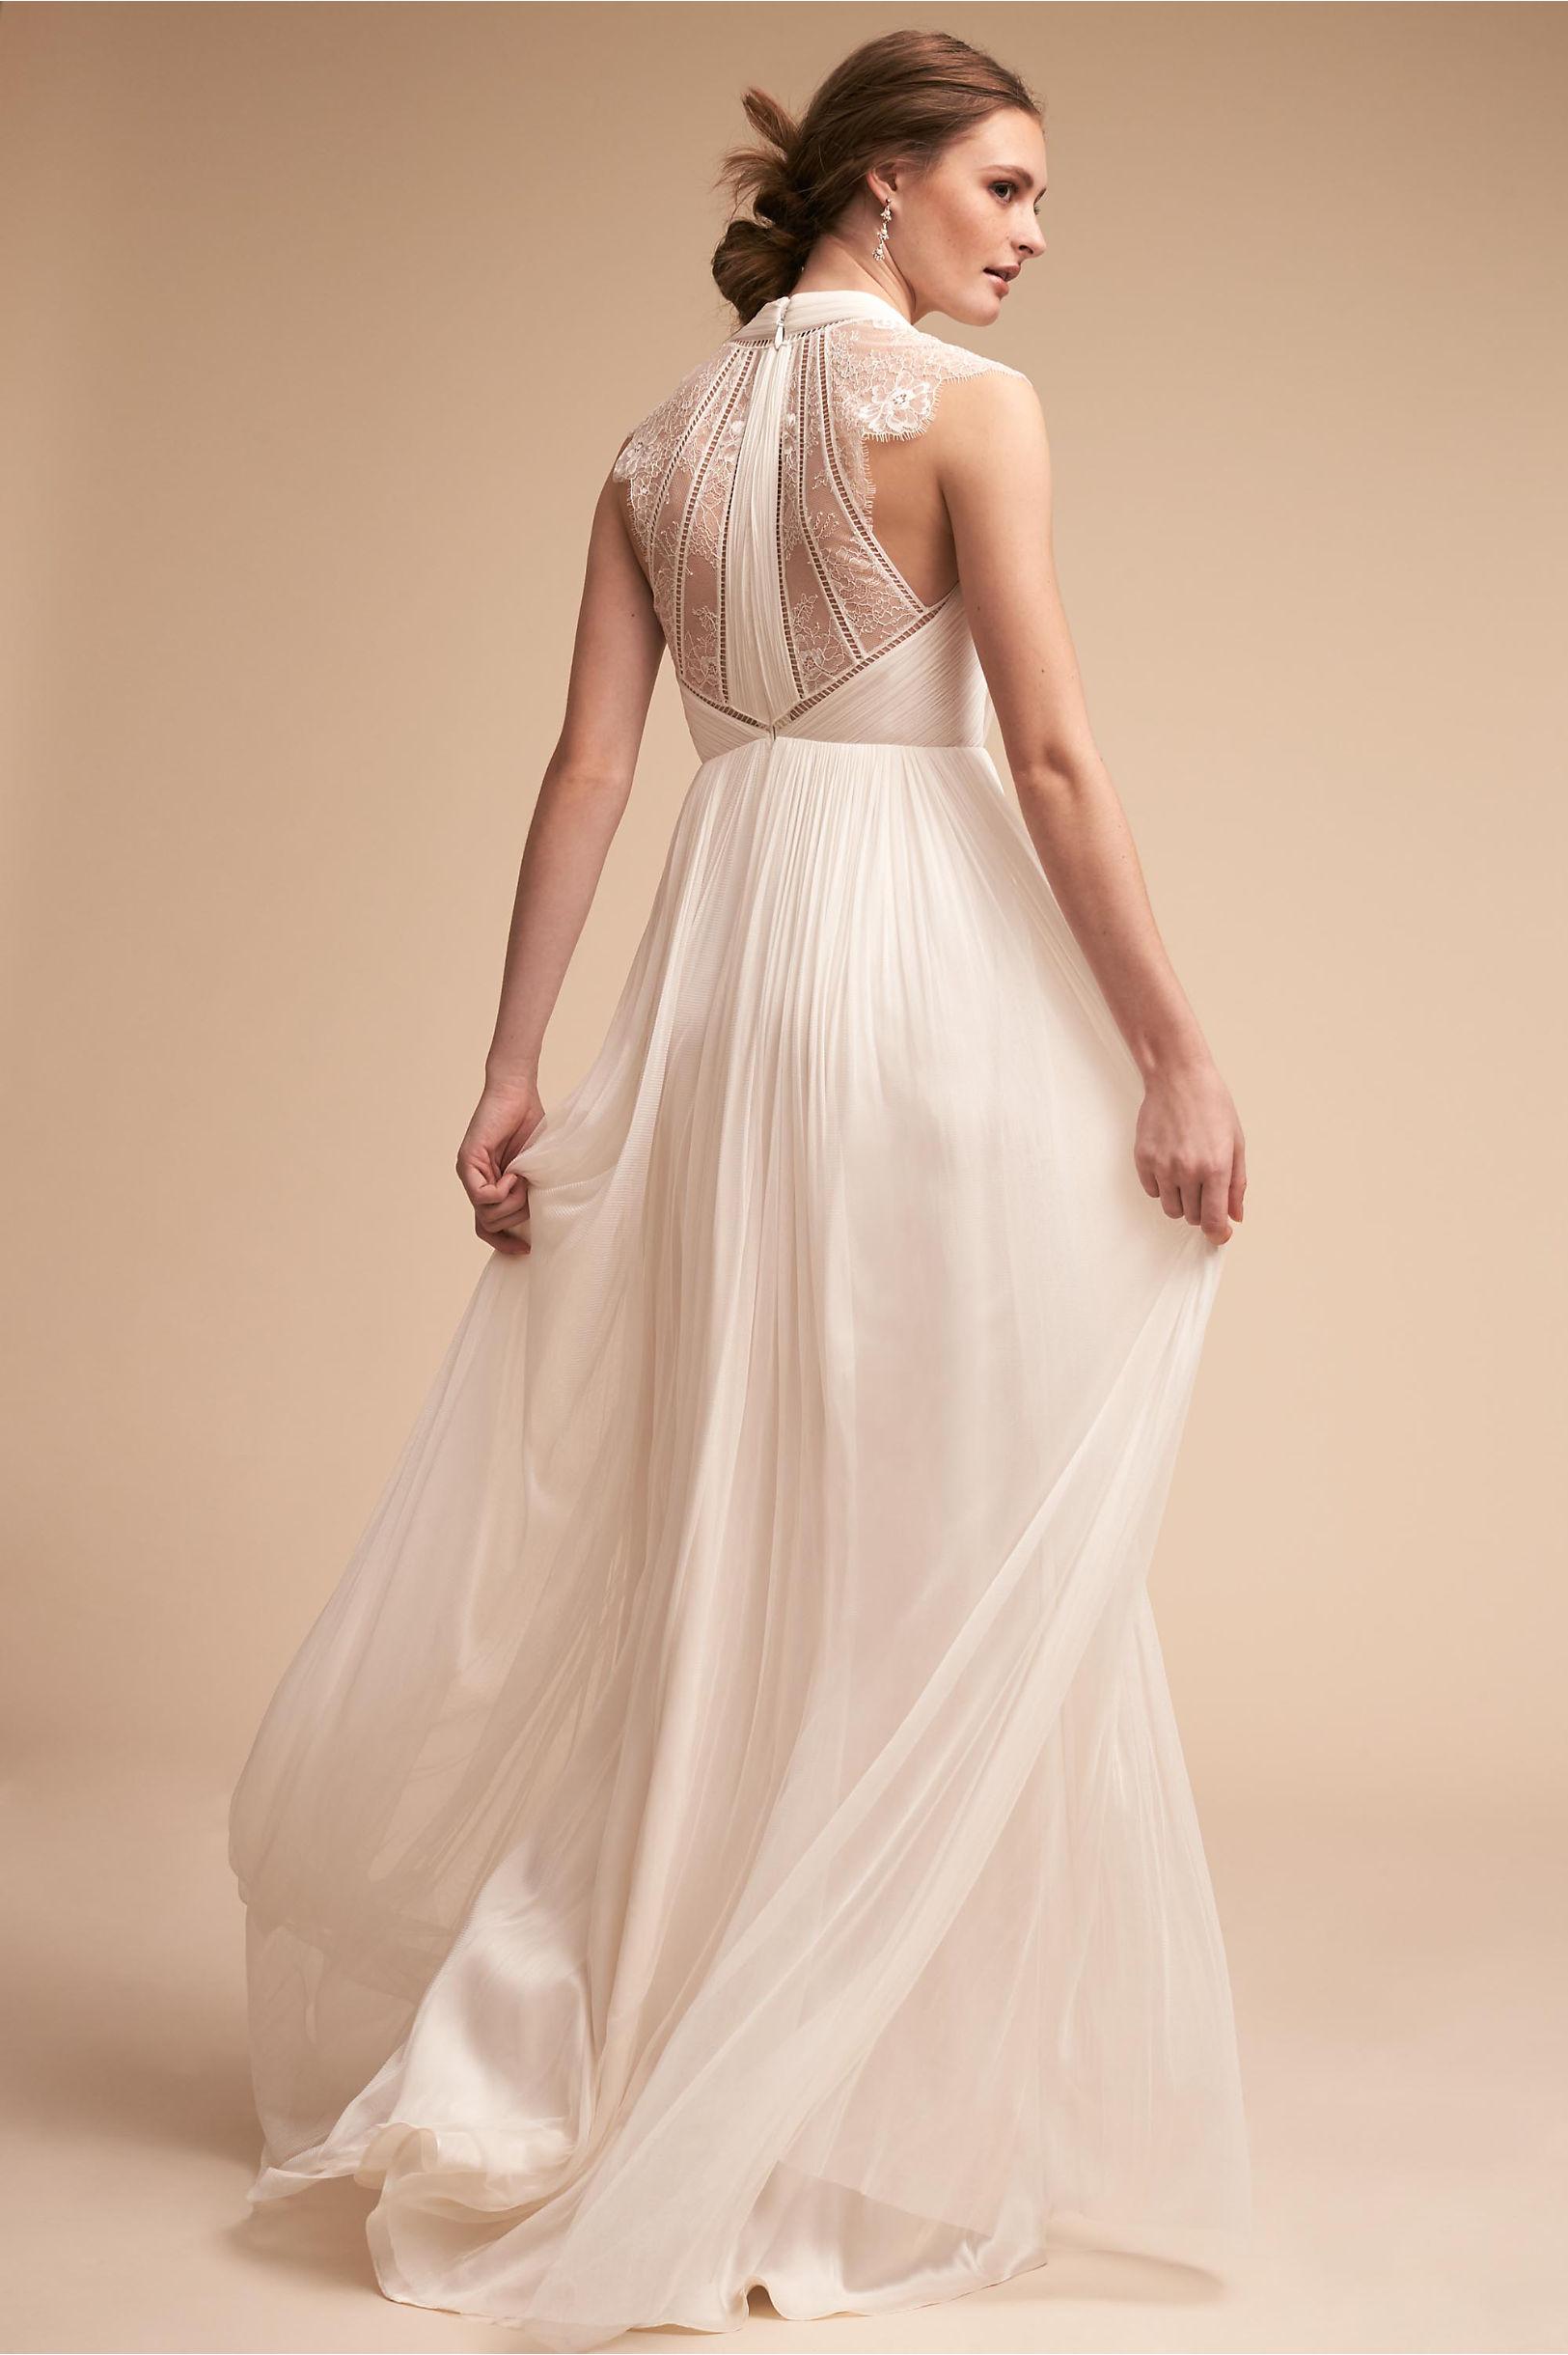 Wedding Dresses & Gowns | BHLDN